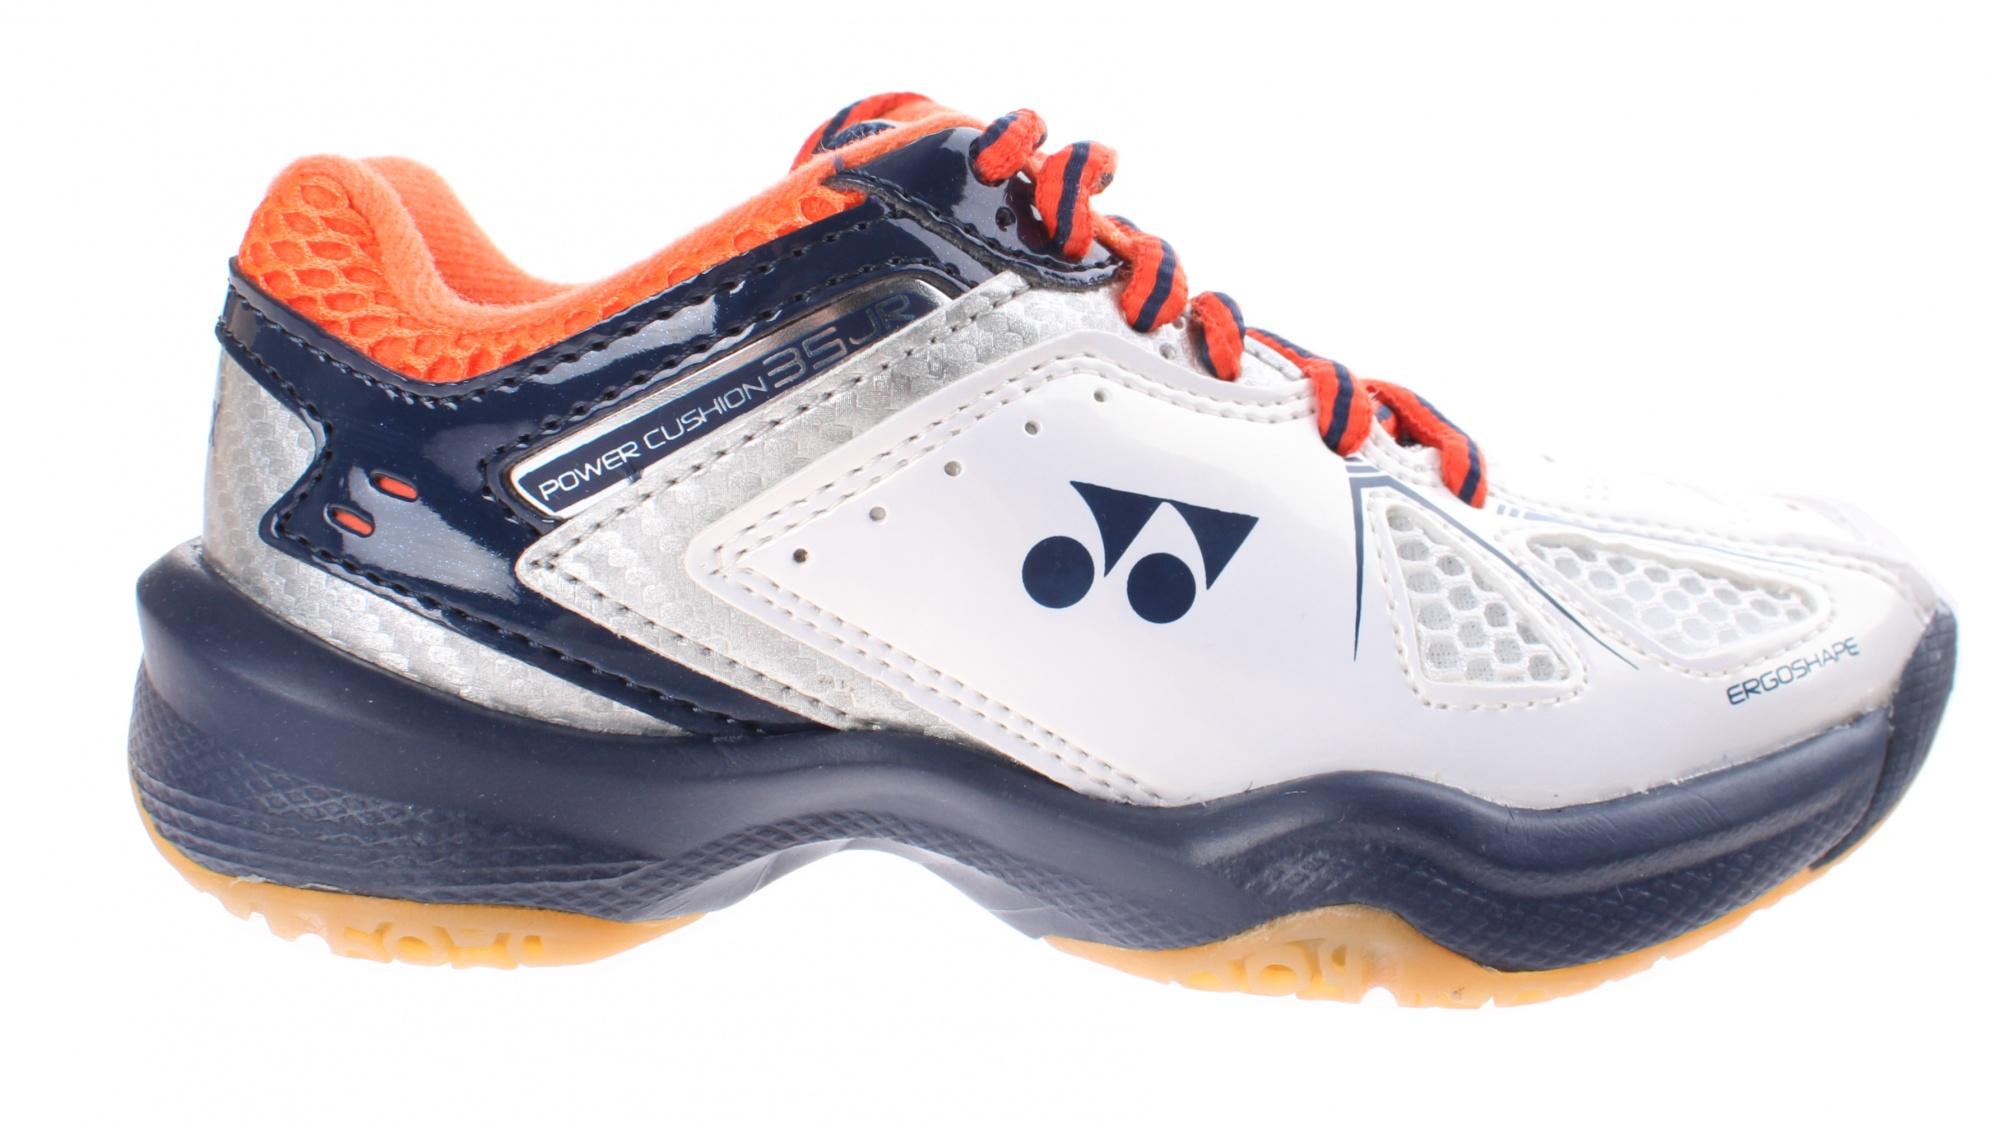 choose genuine purchase genuine shopping badminton shoes SHB junior white/blue/red